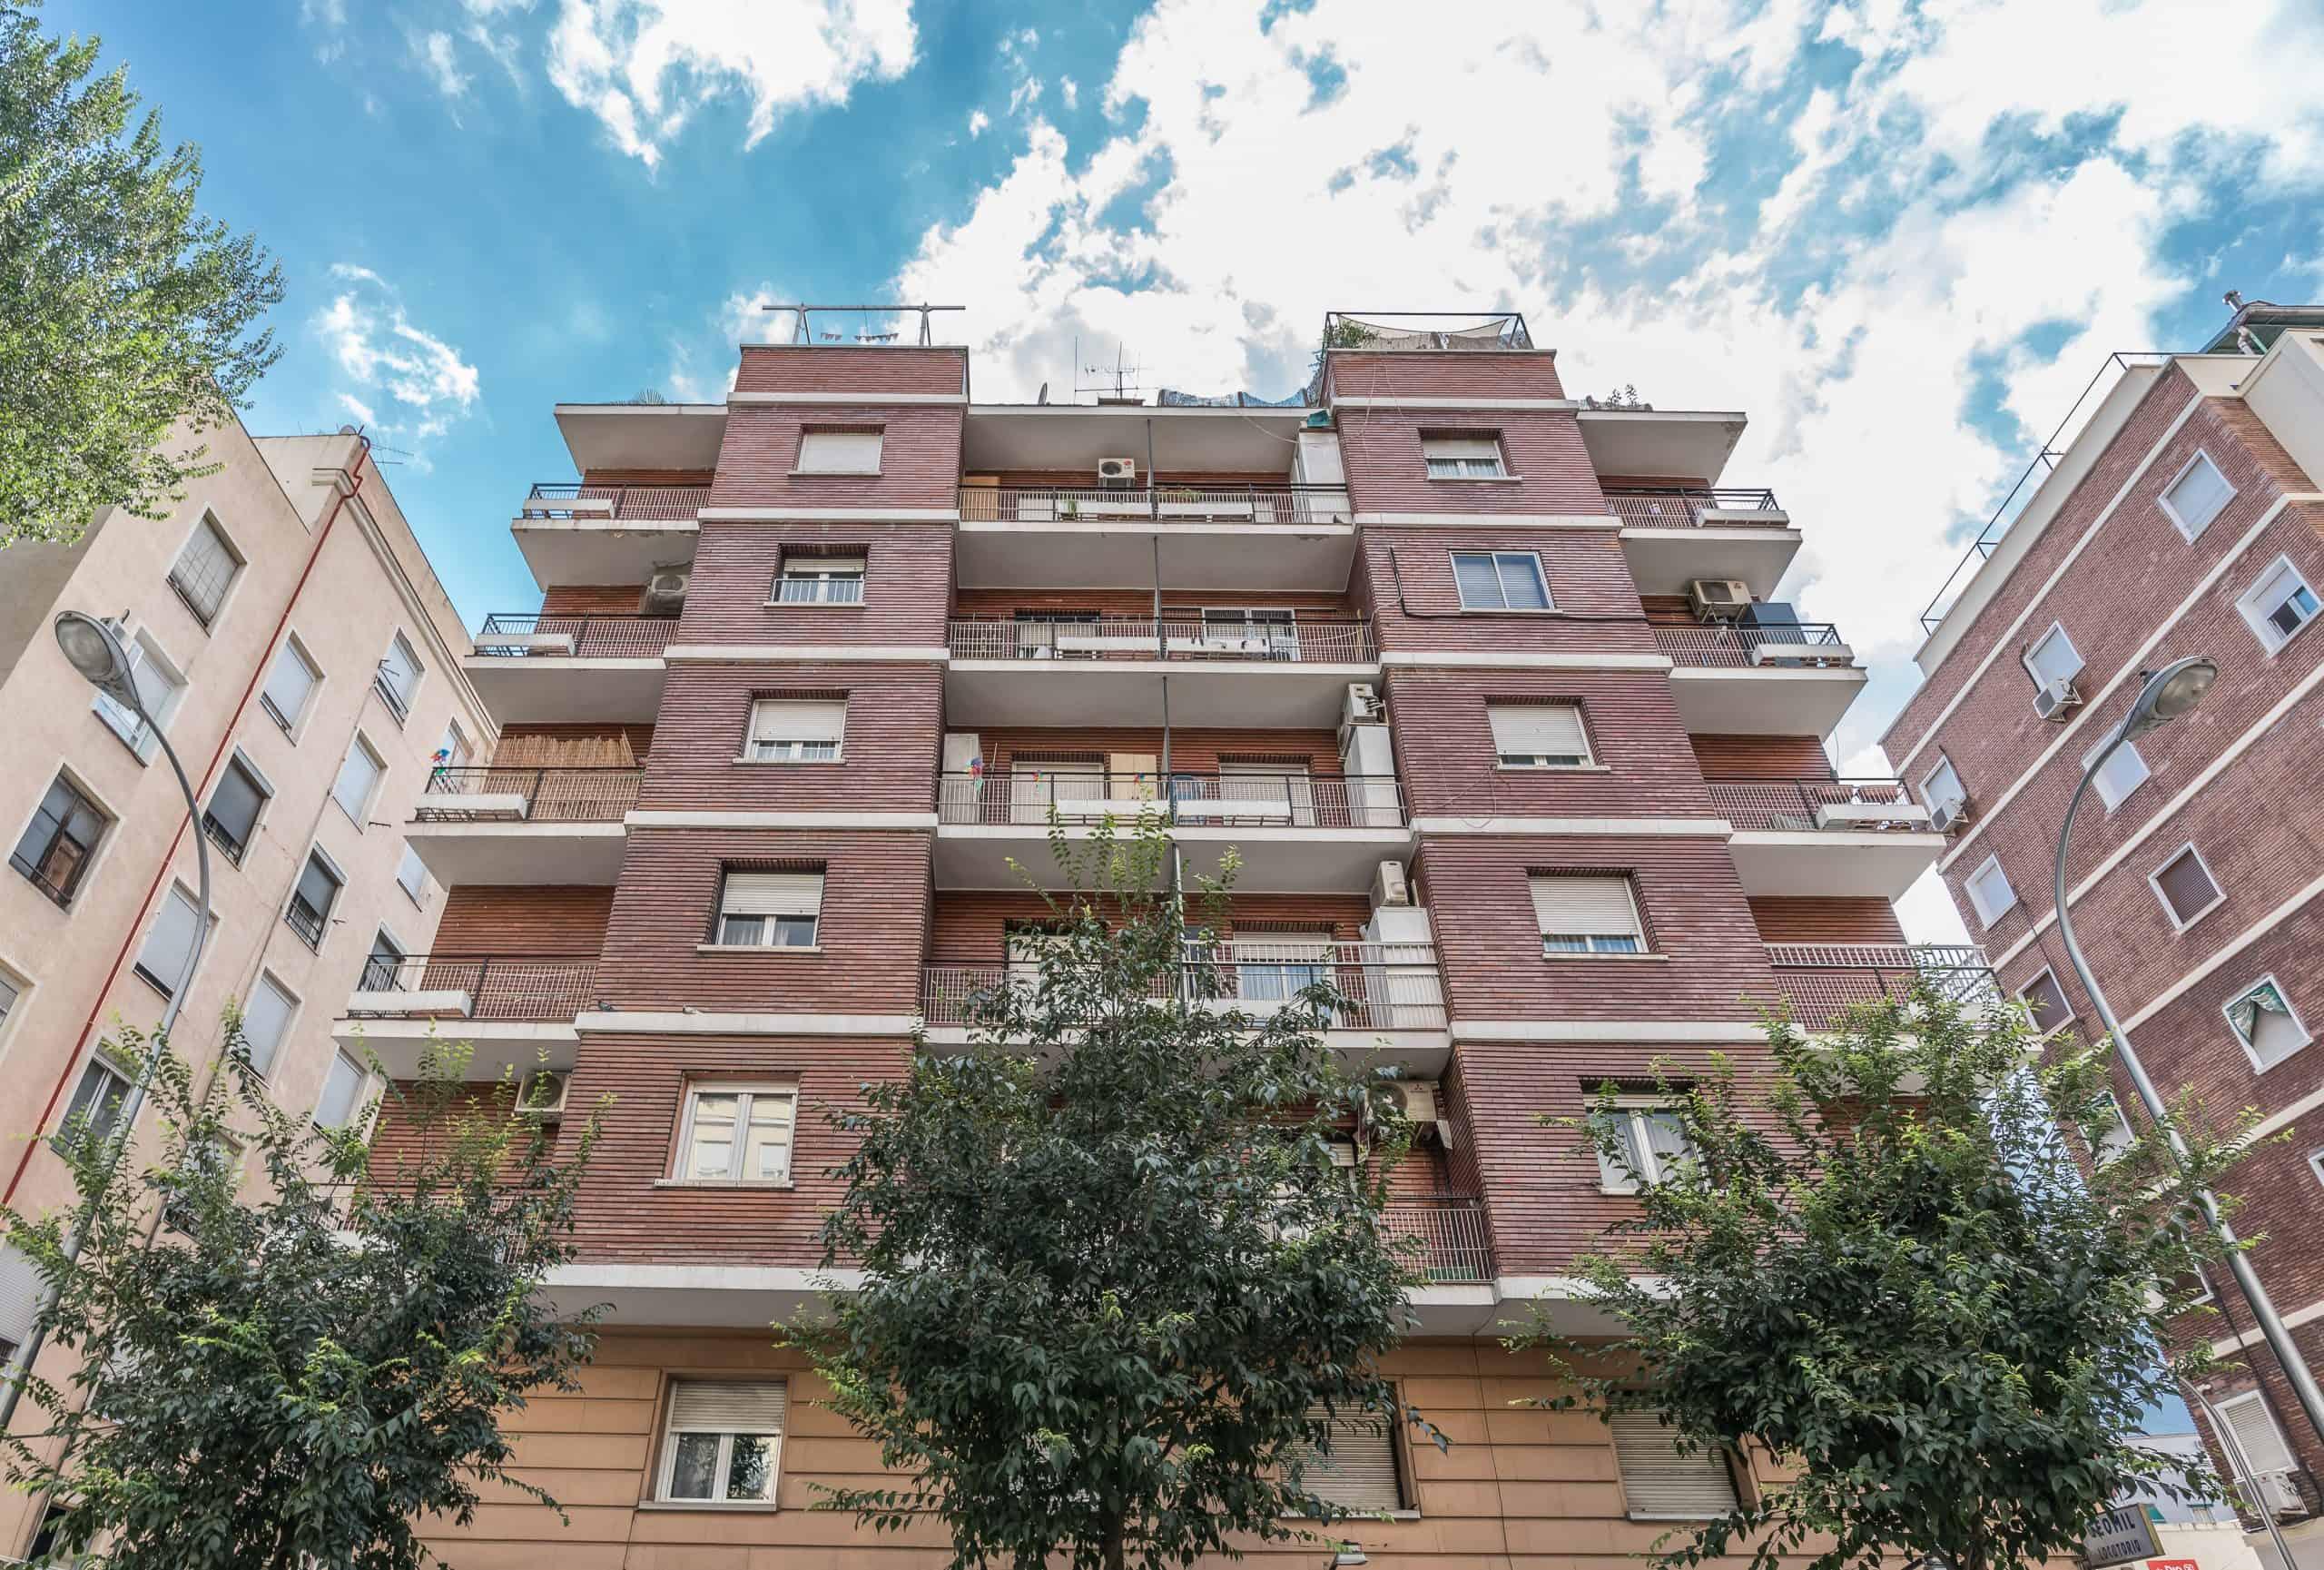 Agencia Inmobiliaria de Madrid-FUTUROCASA-calle Embajadores-Chopera-Arganzuela9 FACHADA (1)